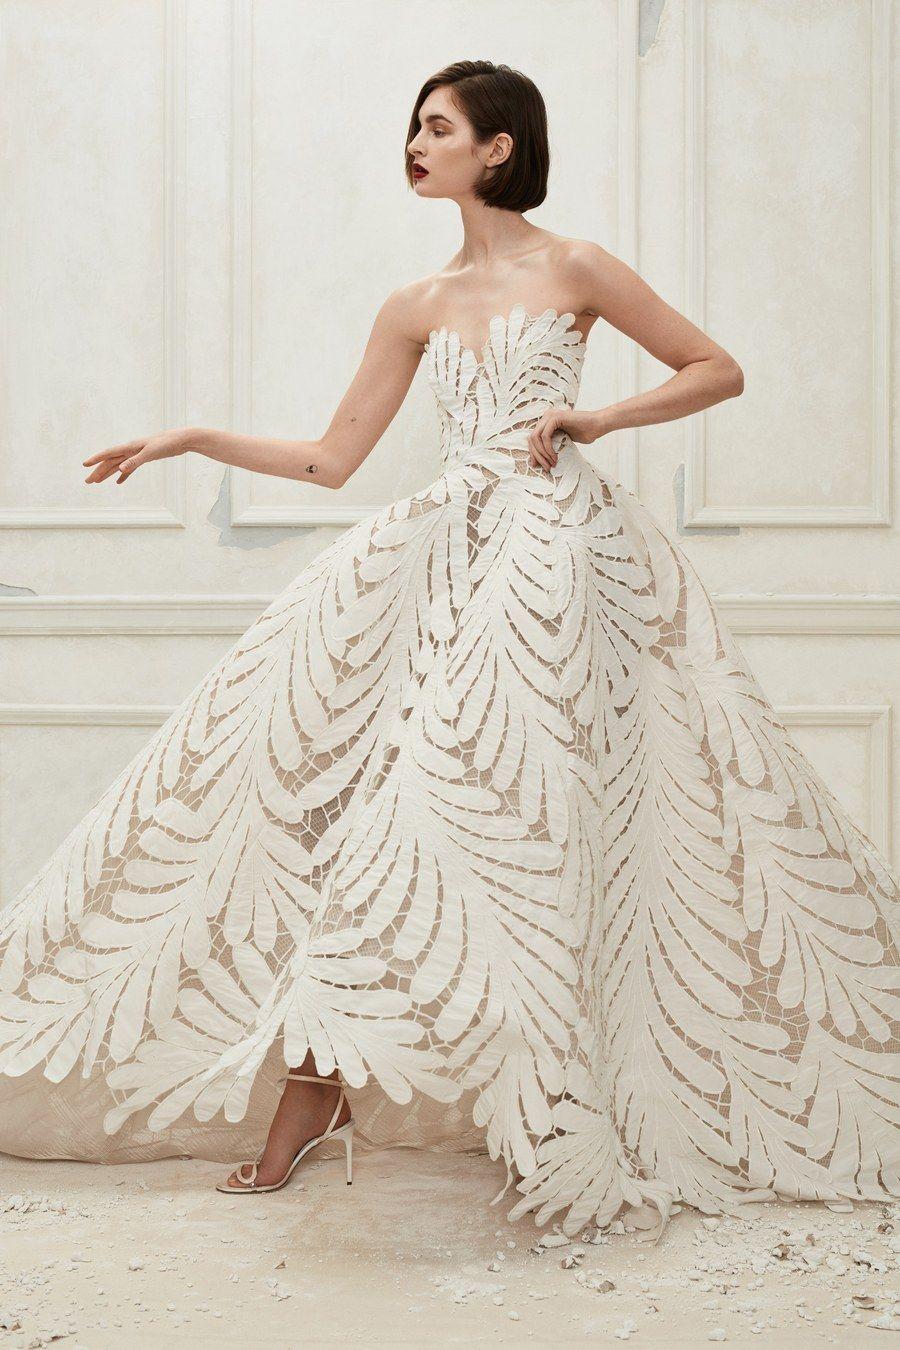 Blinged out wedding dress  Oscar de la Renta Bridal Fall  Fashion Show  Oscar De La Renta